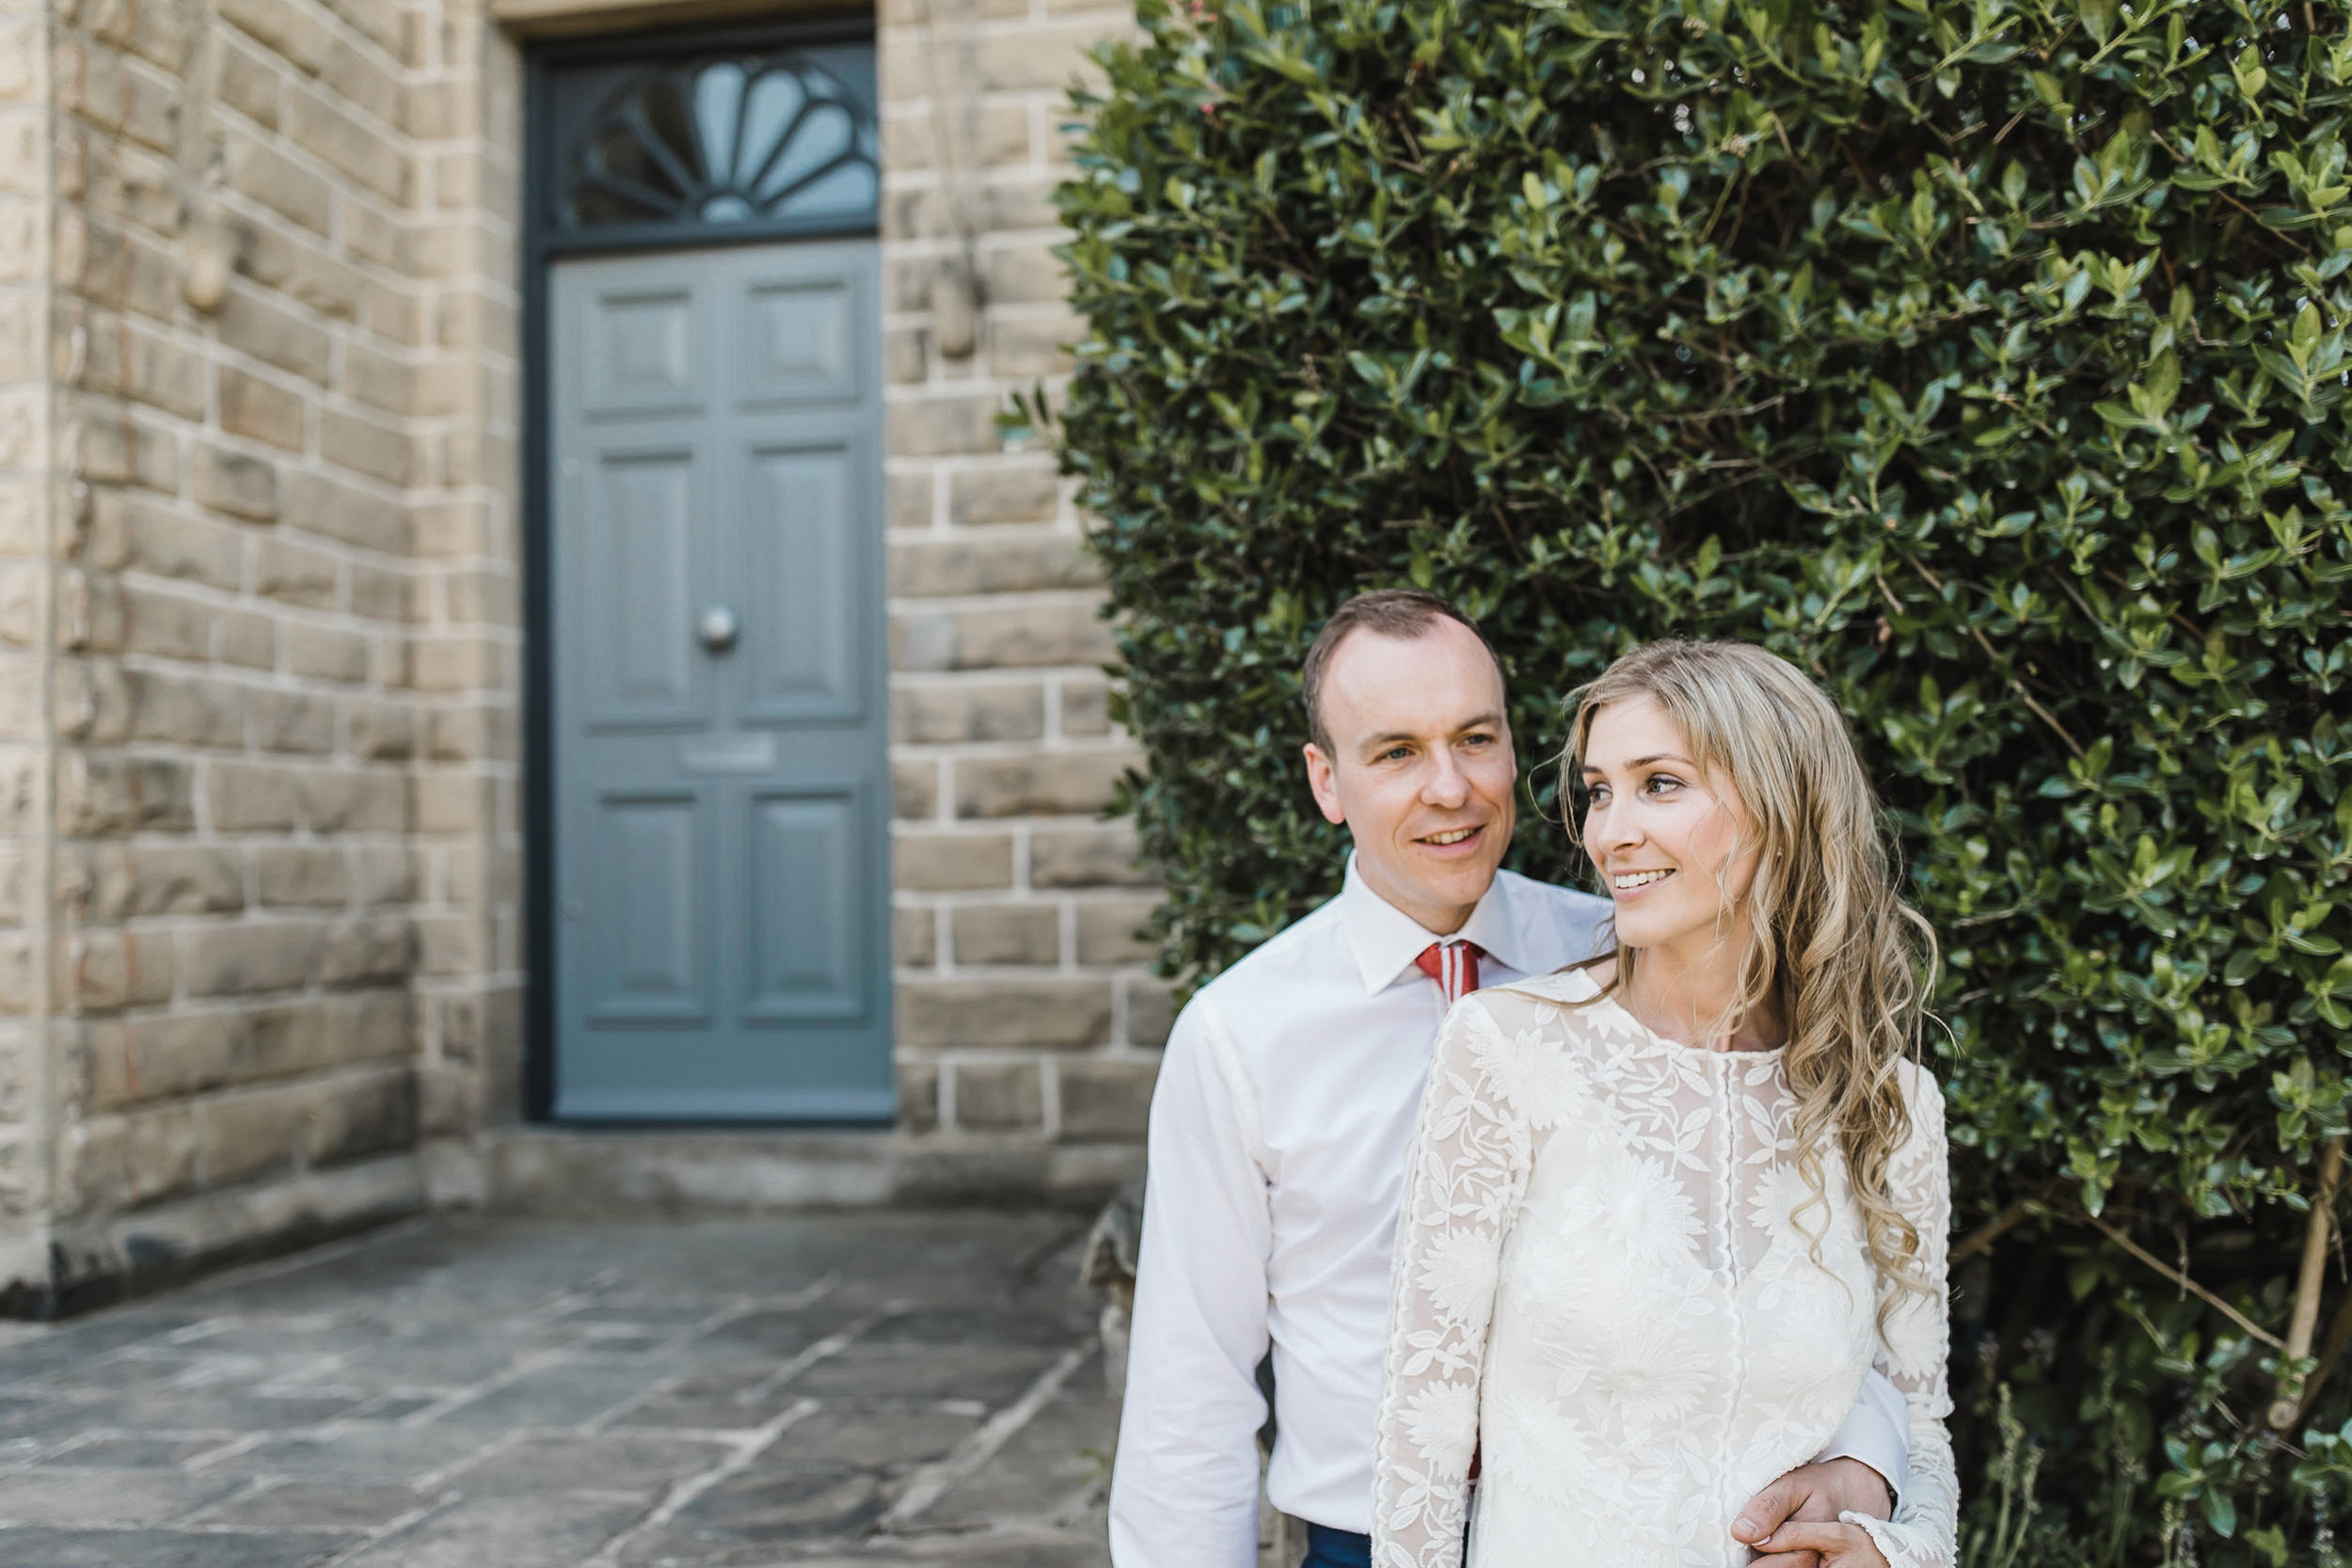 Roundhay-Leeds-Backyard-Wedding-Becs-Chris-188.jpg